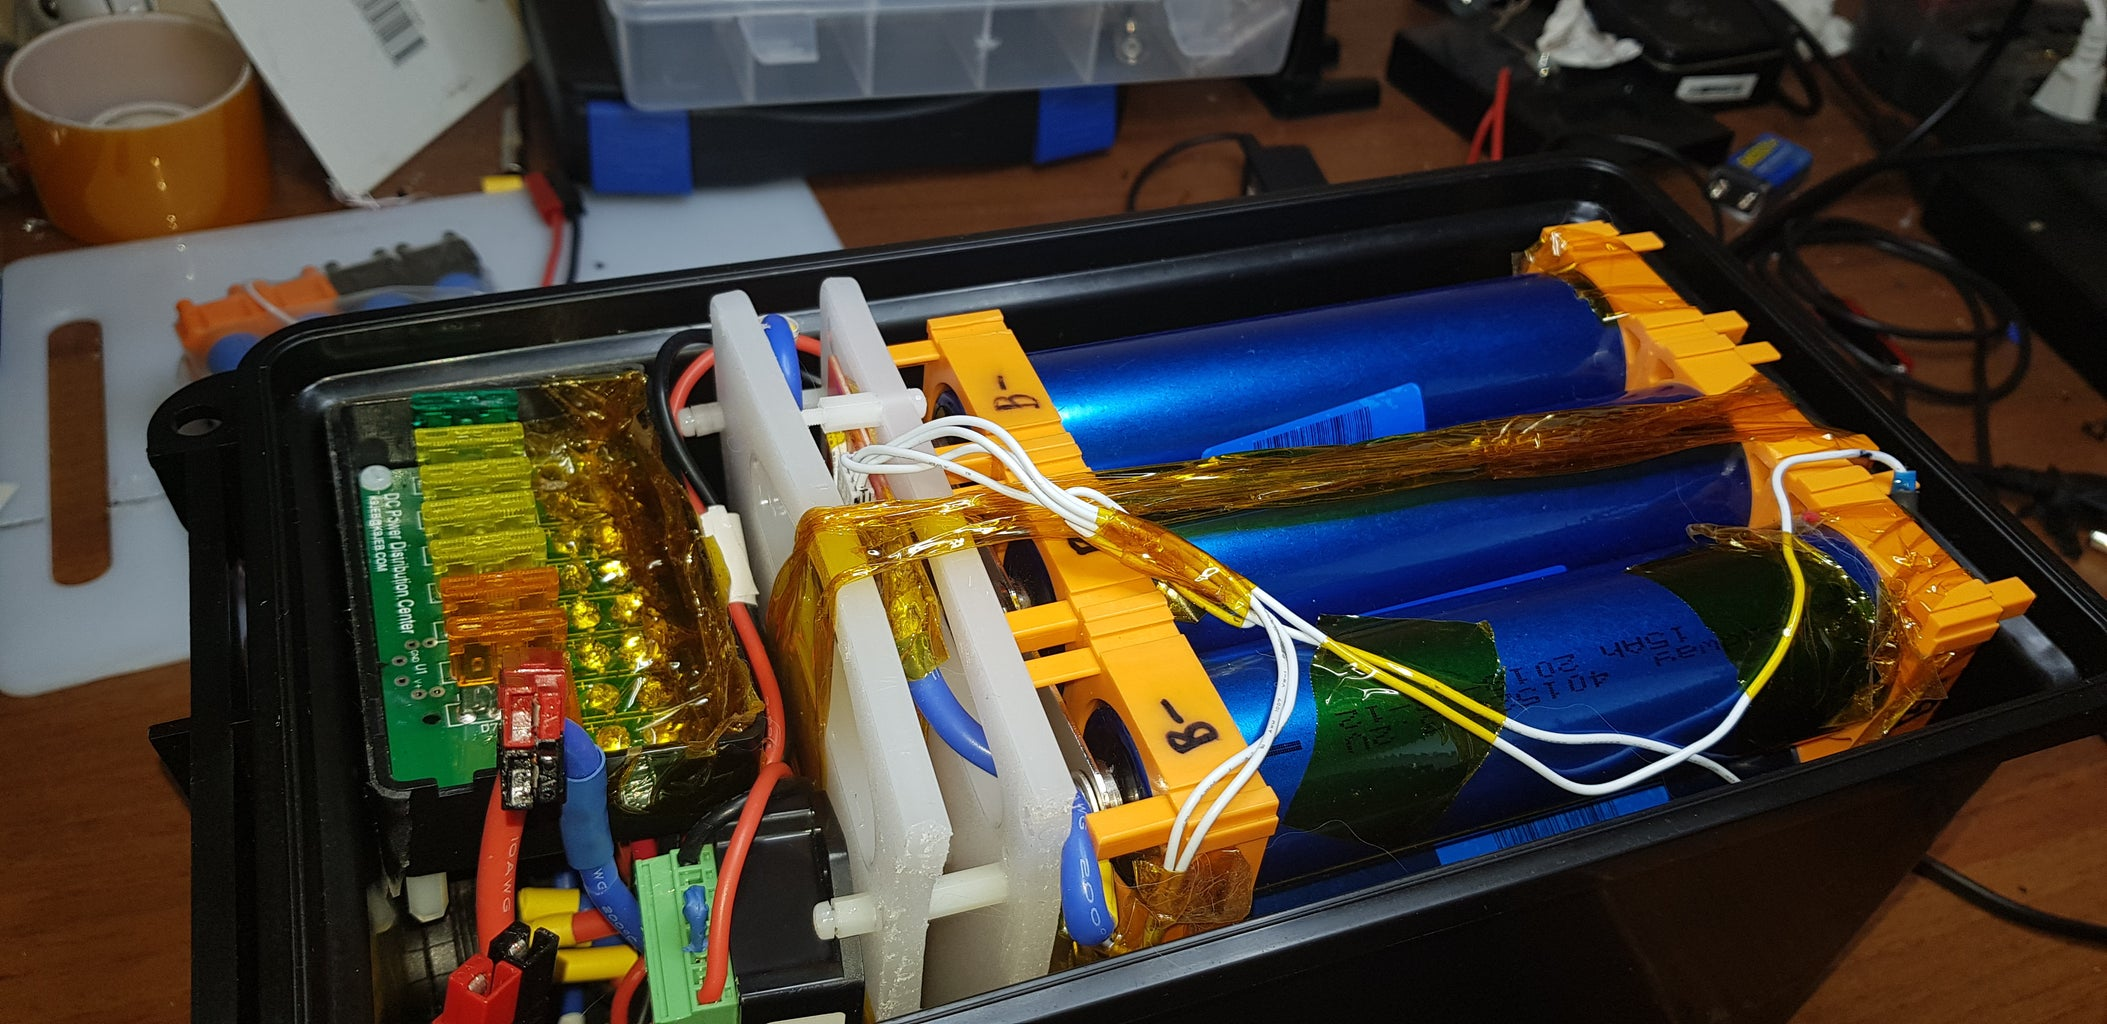 576 Watt Hour Portable Solar Generator